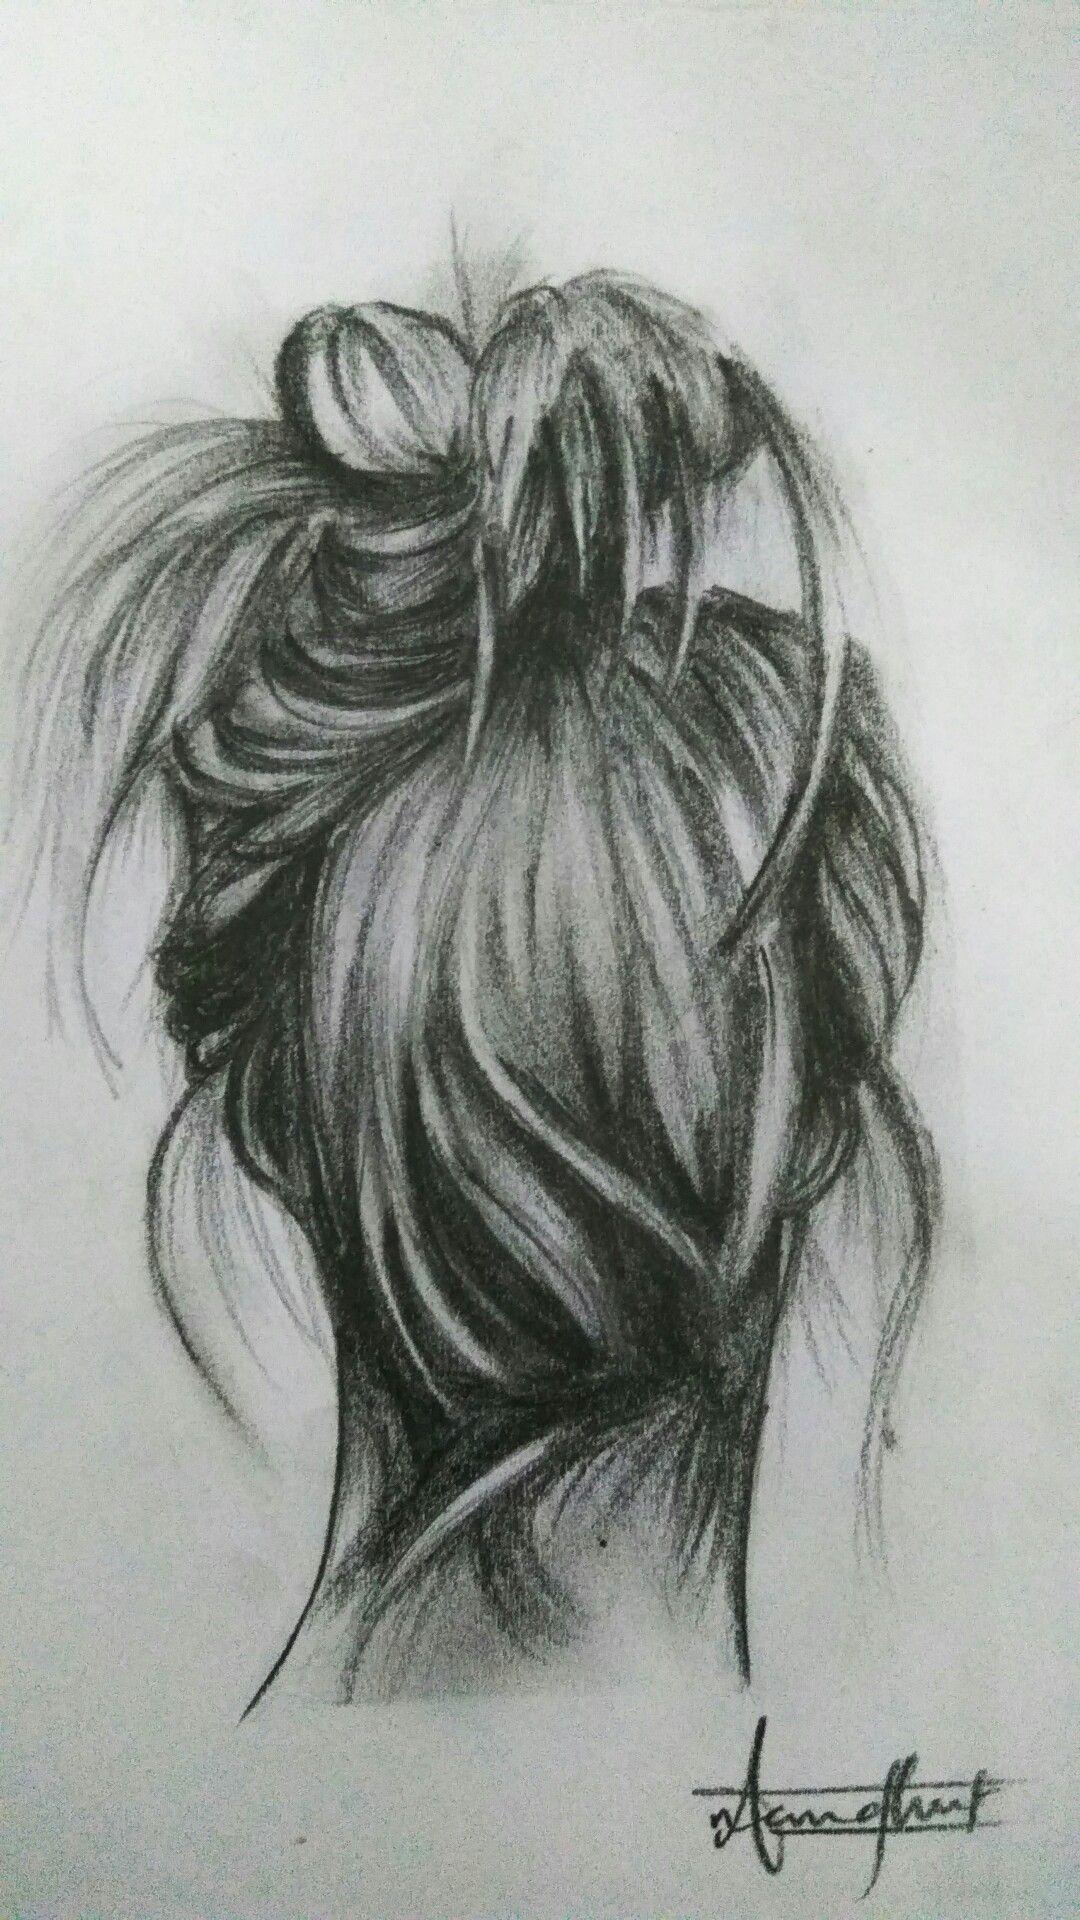 Messy Hair Messy Life Hair Mess Pencilsketch Pencil Sketch Messy Hairstyles Female Sketch